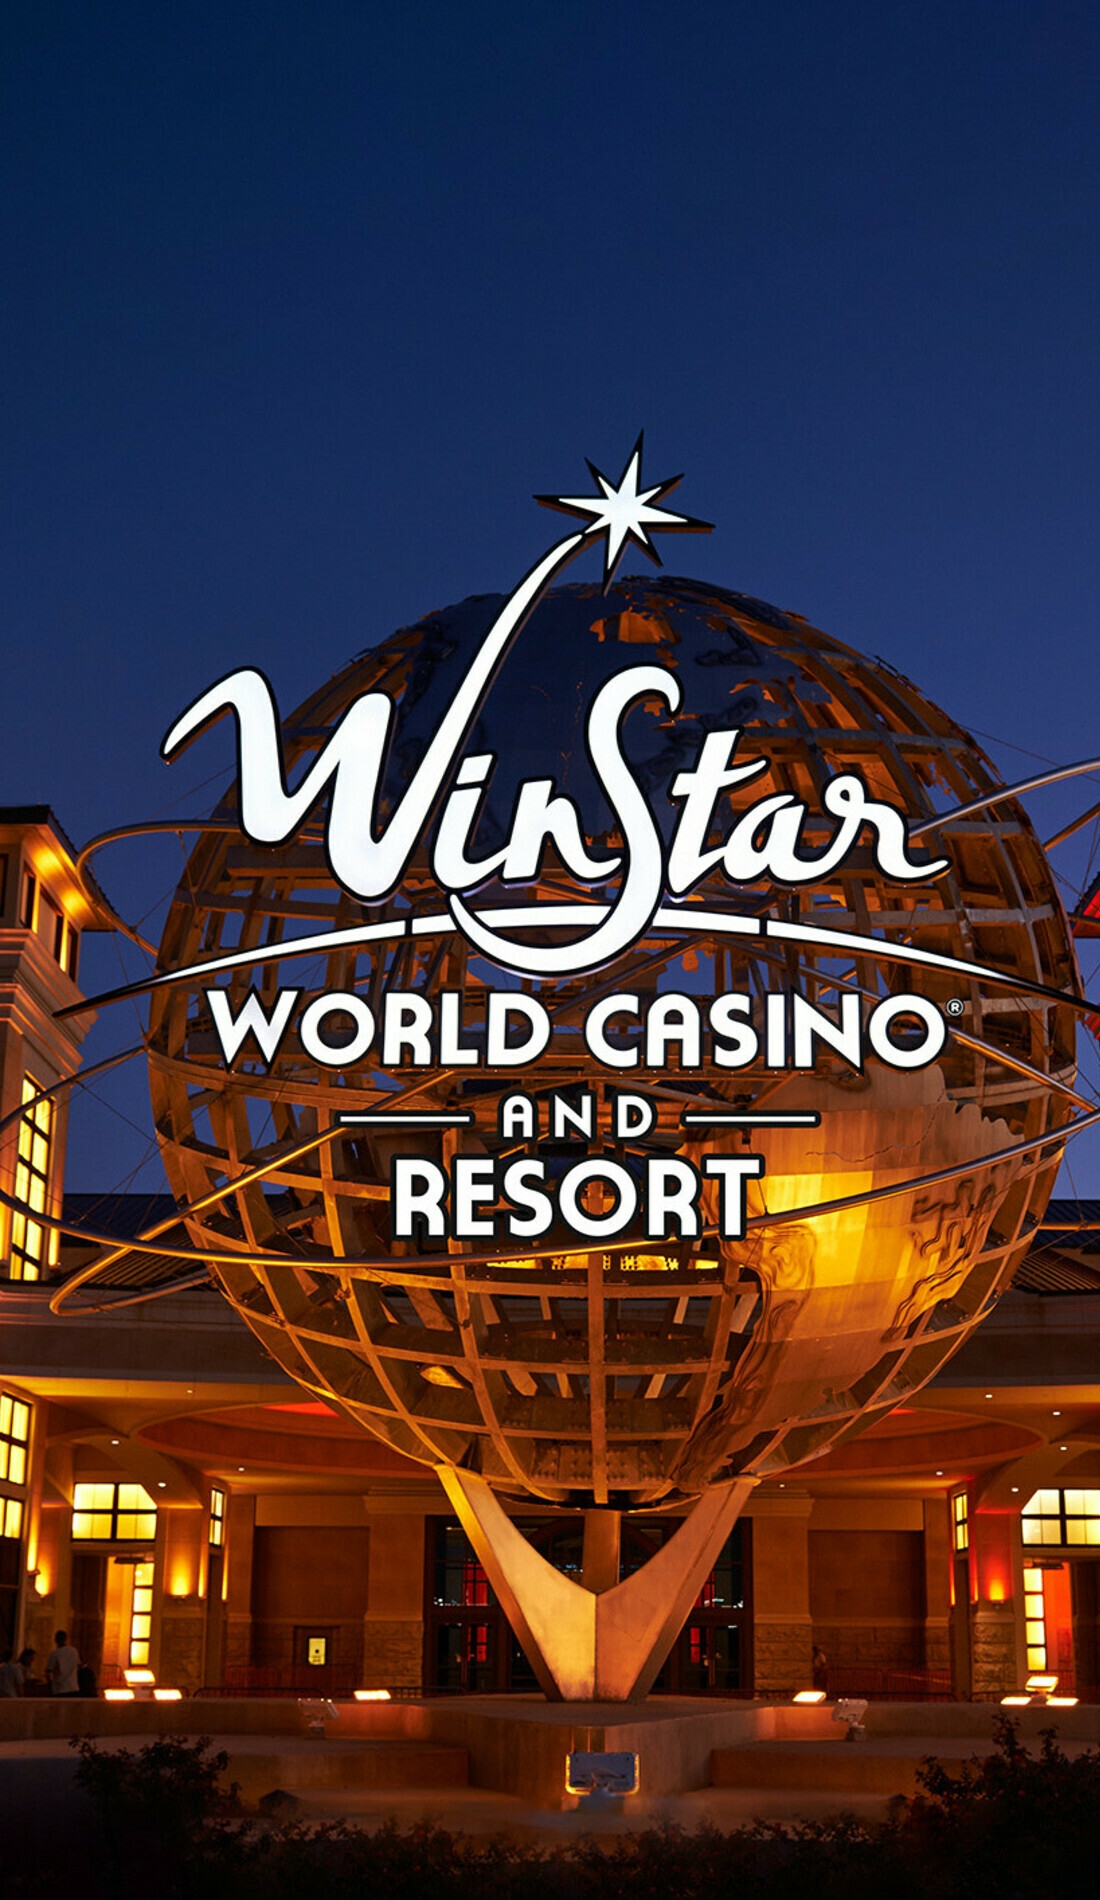 A WinStar World Casino and Resort live event